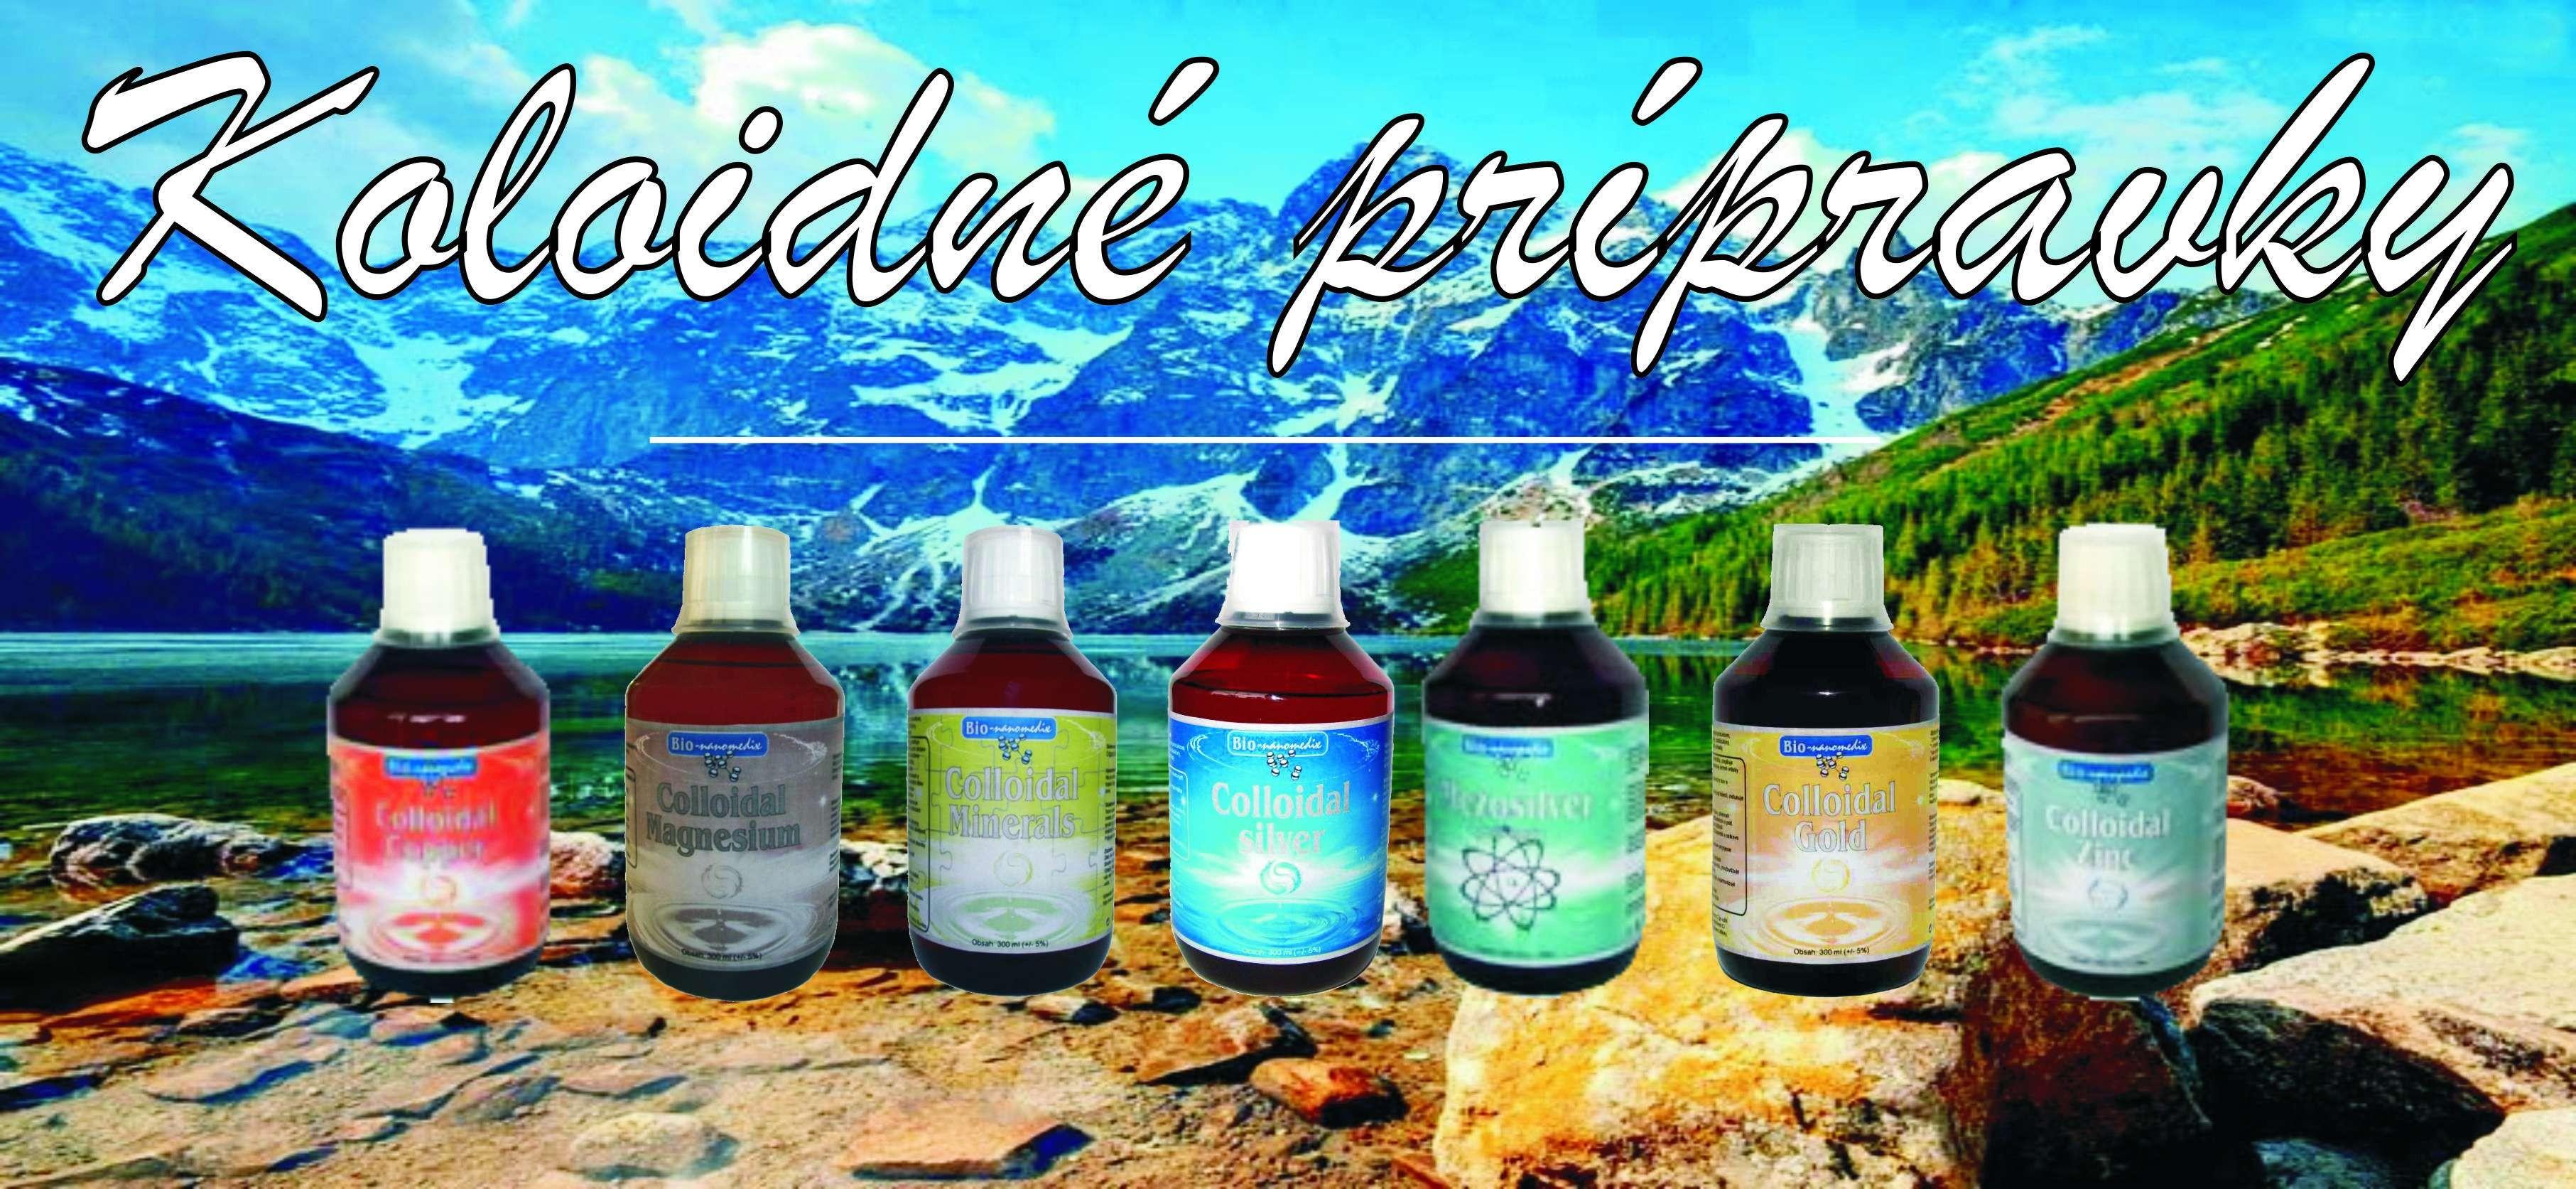 Koloidné produkty